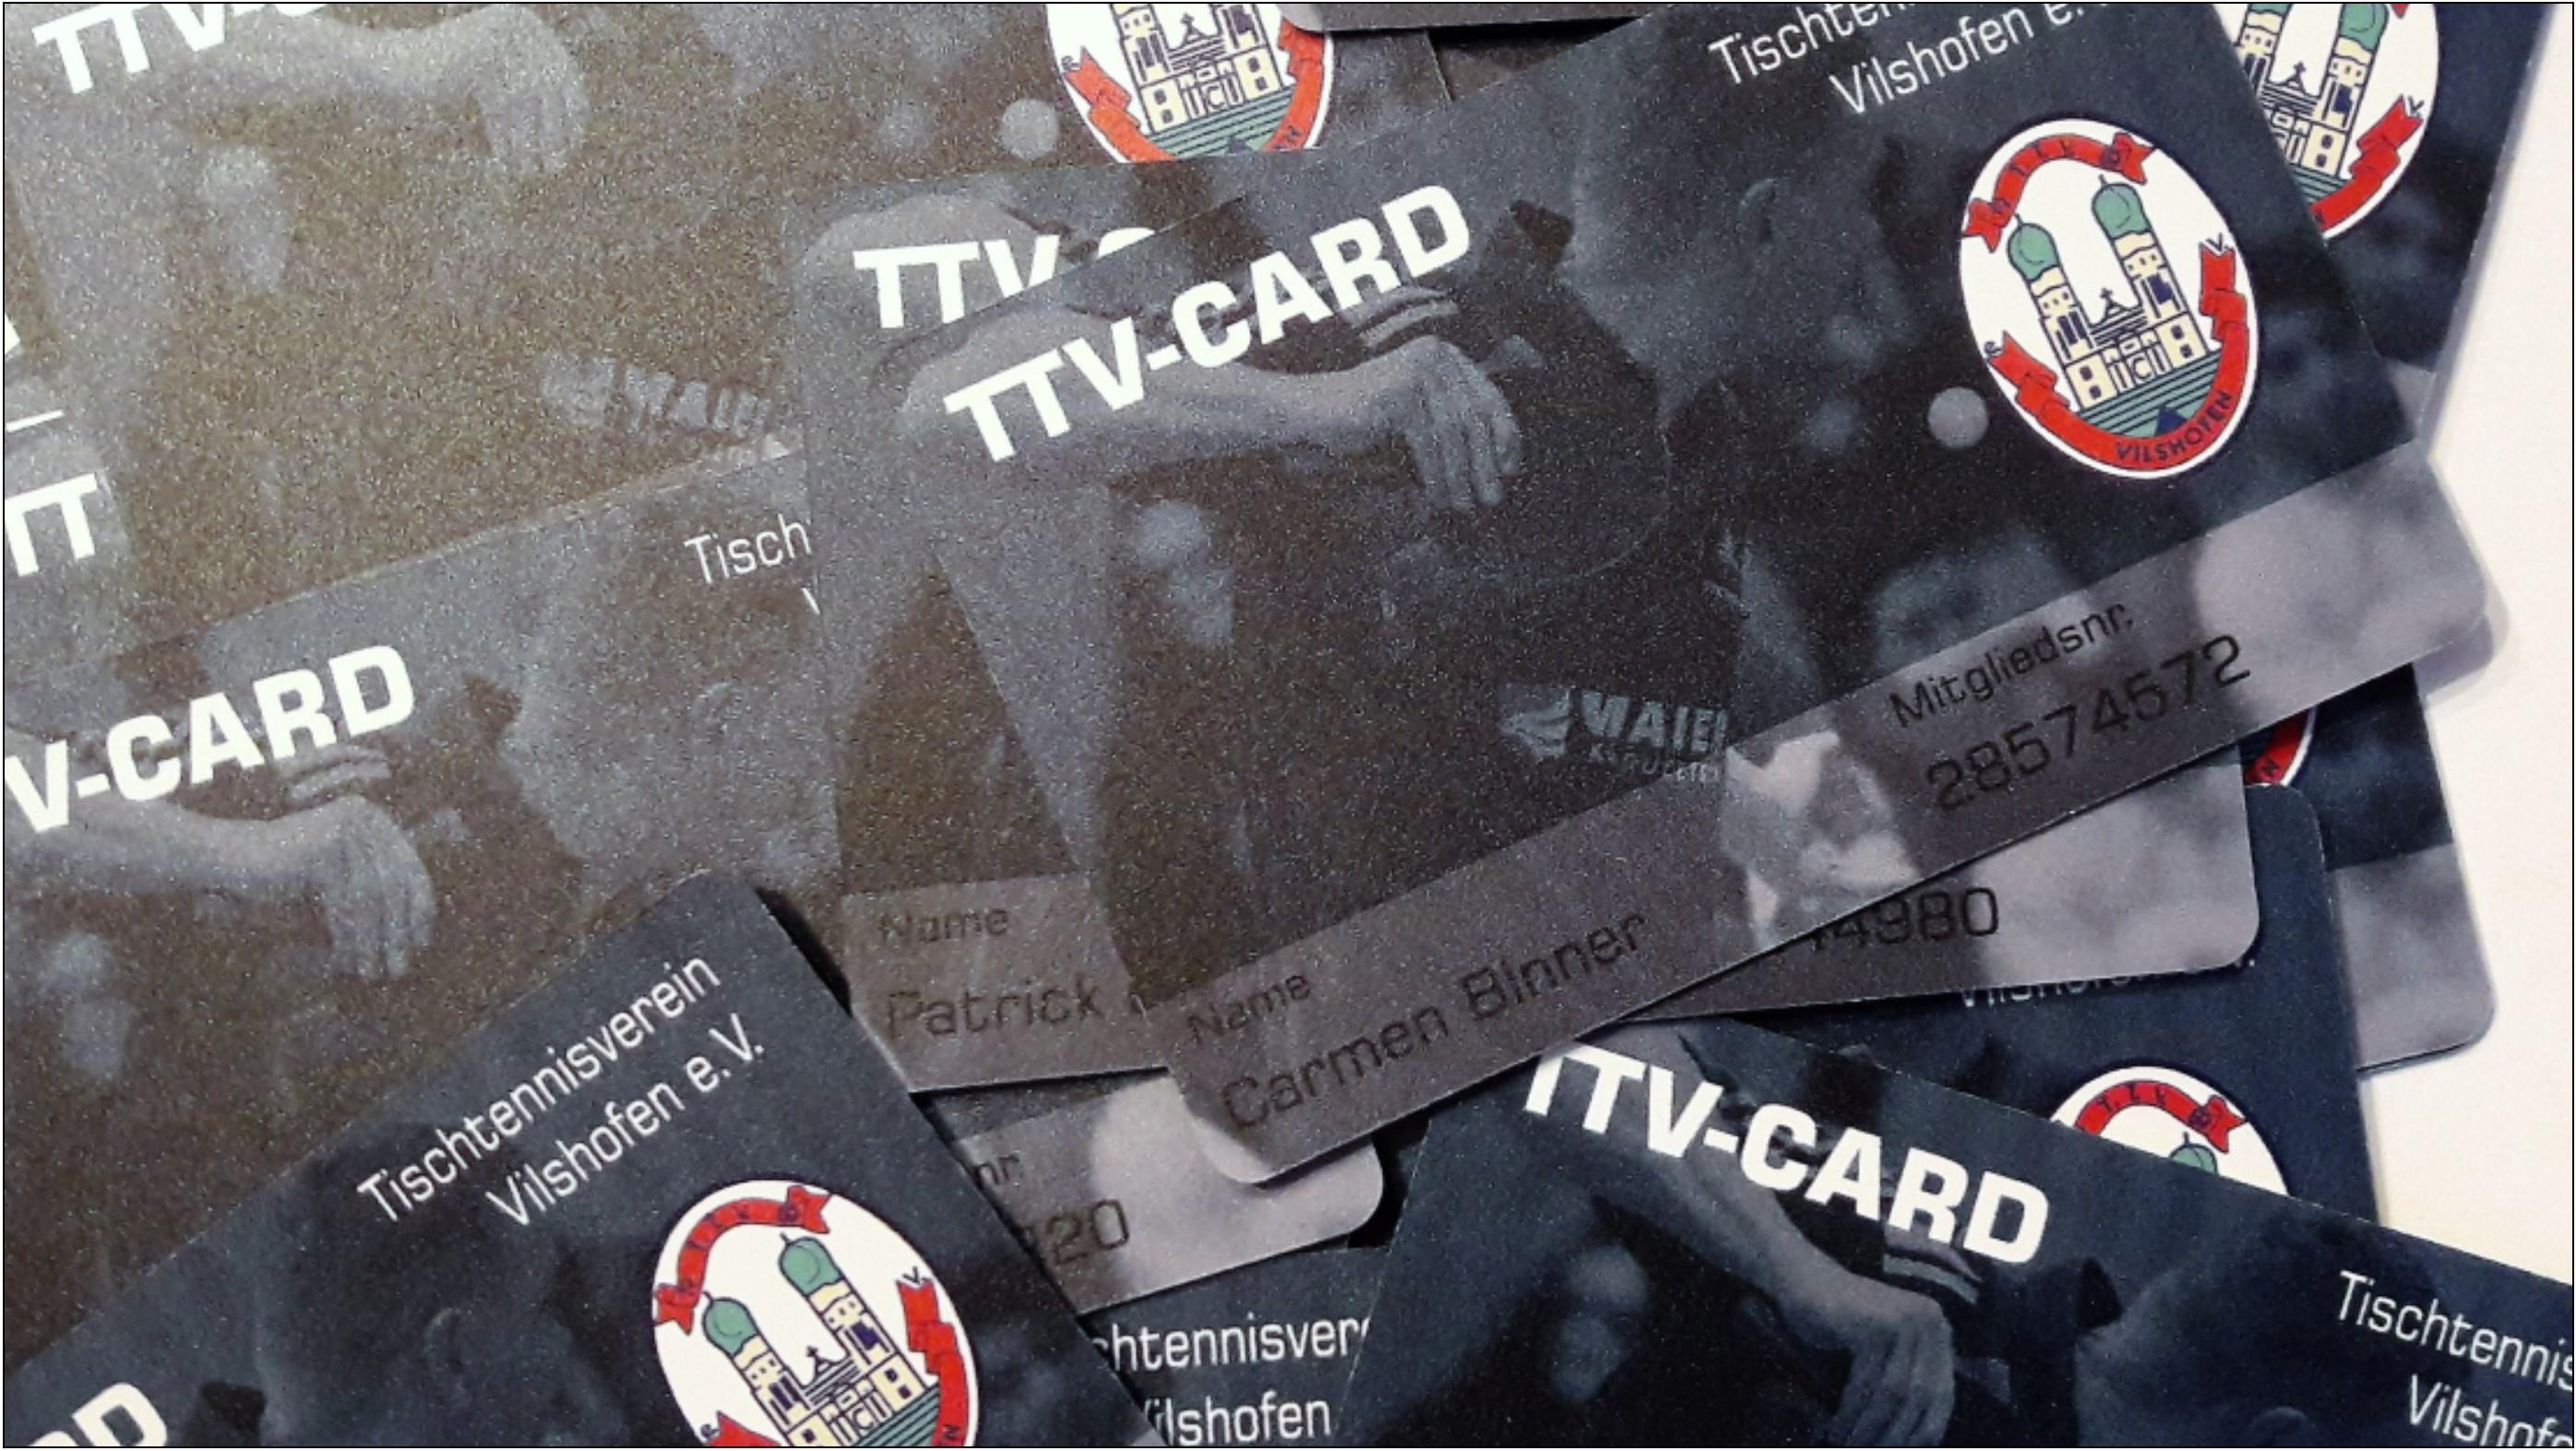 Mitgliedskarte des TTV Vilshofen